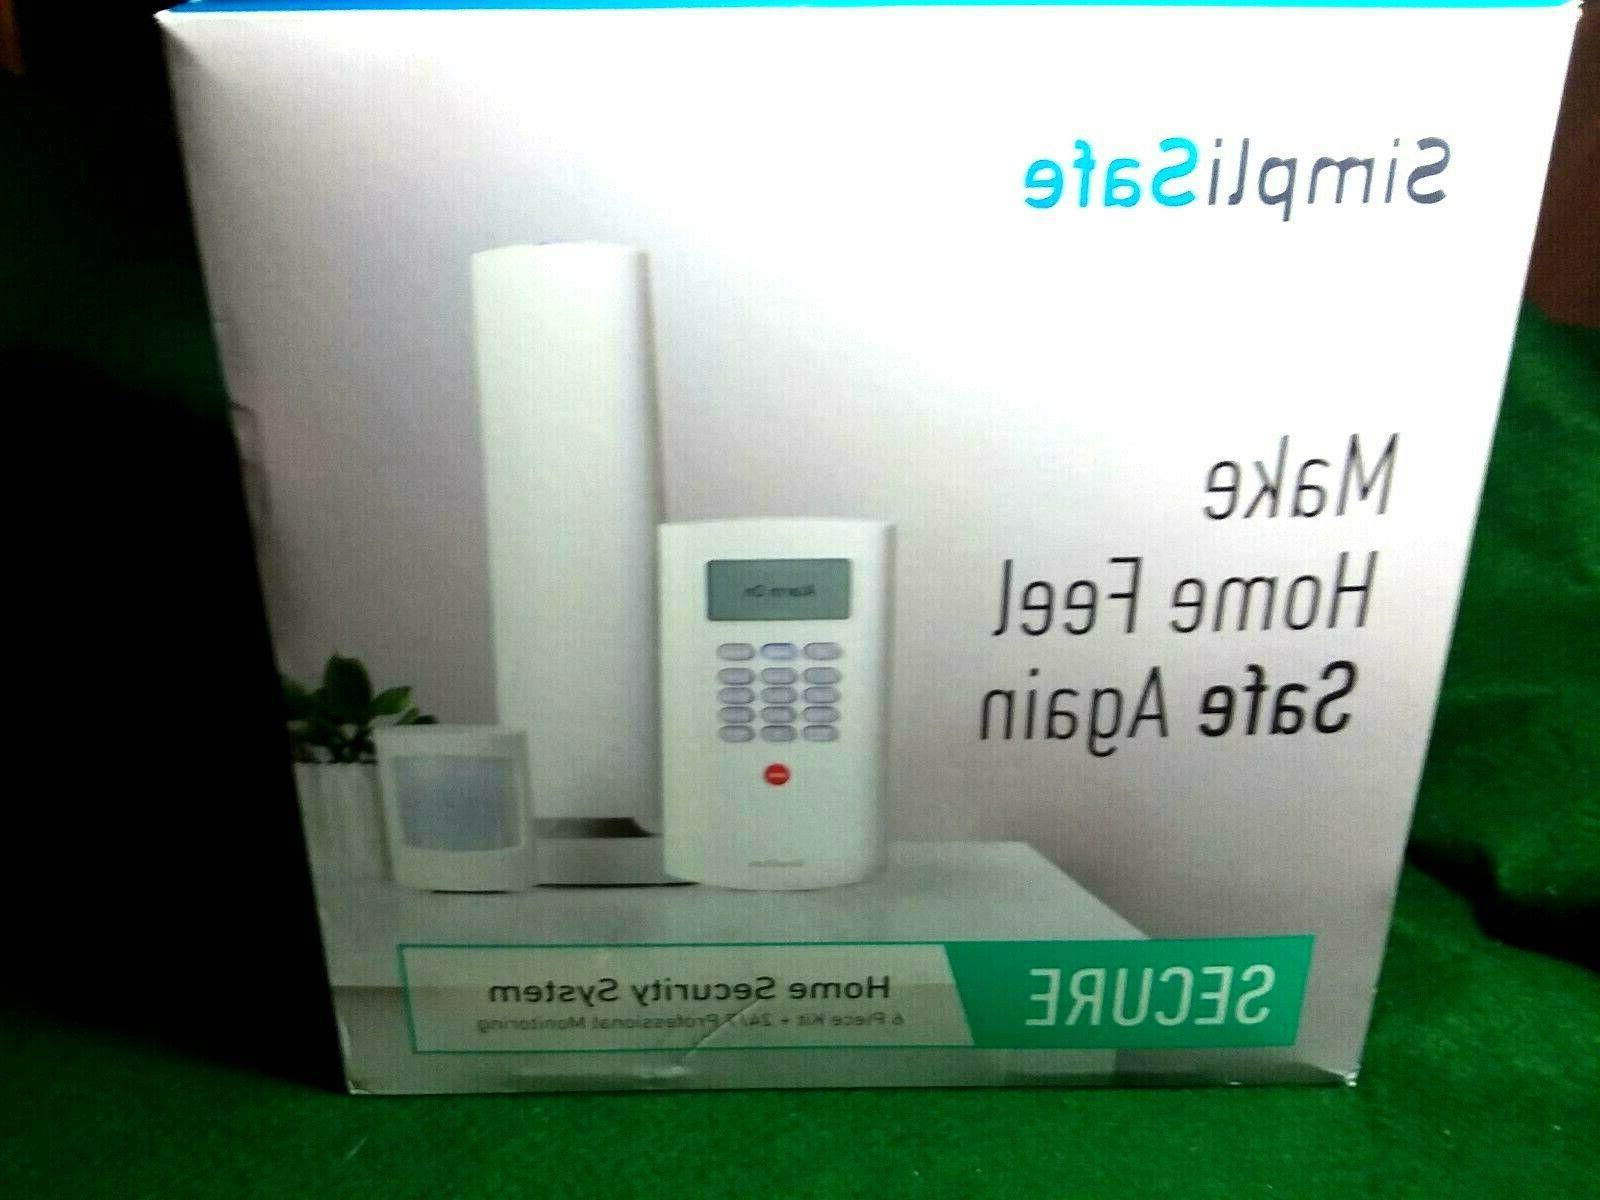 simplysafe secure wireless home safe security alarm